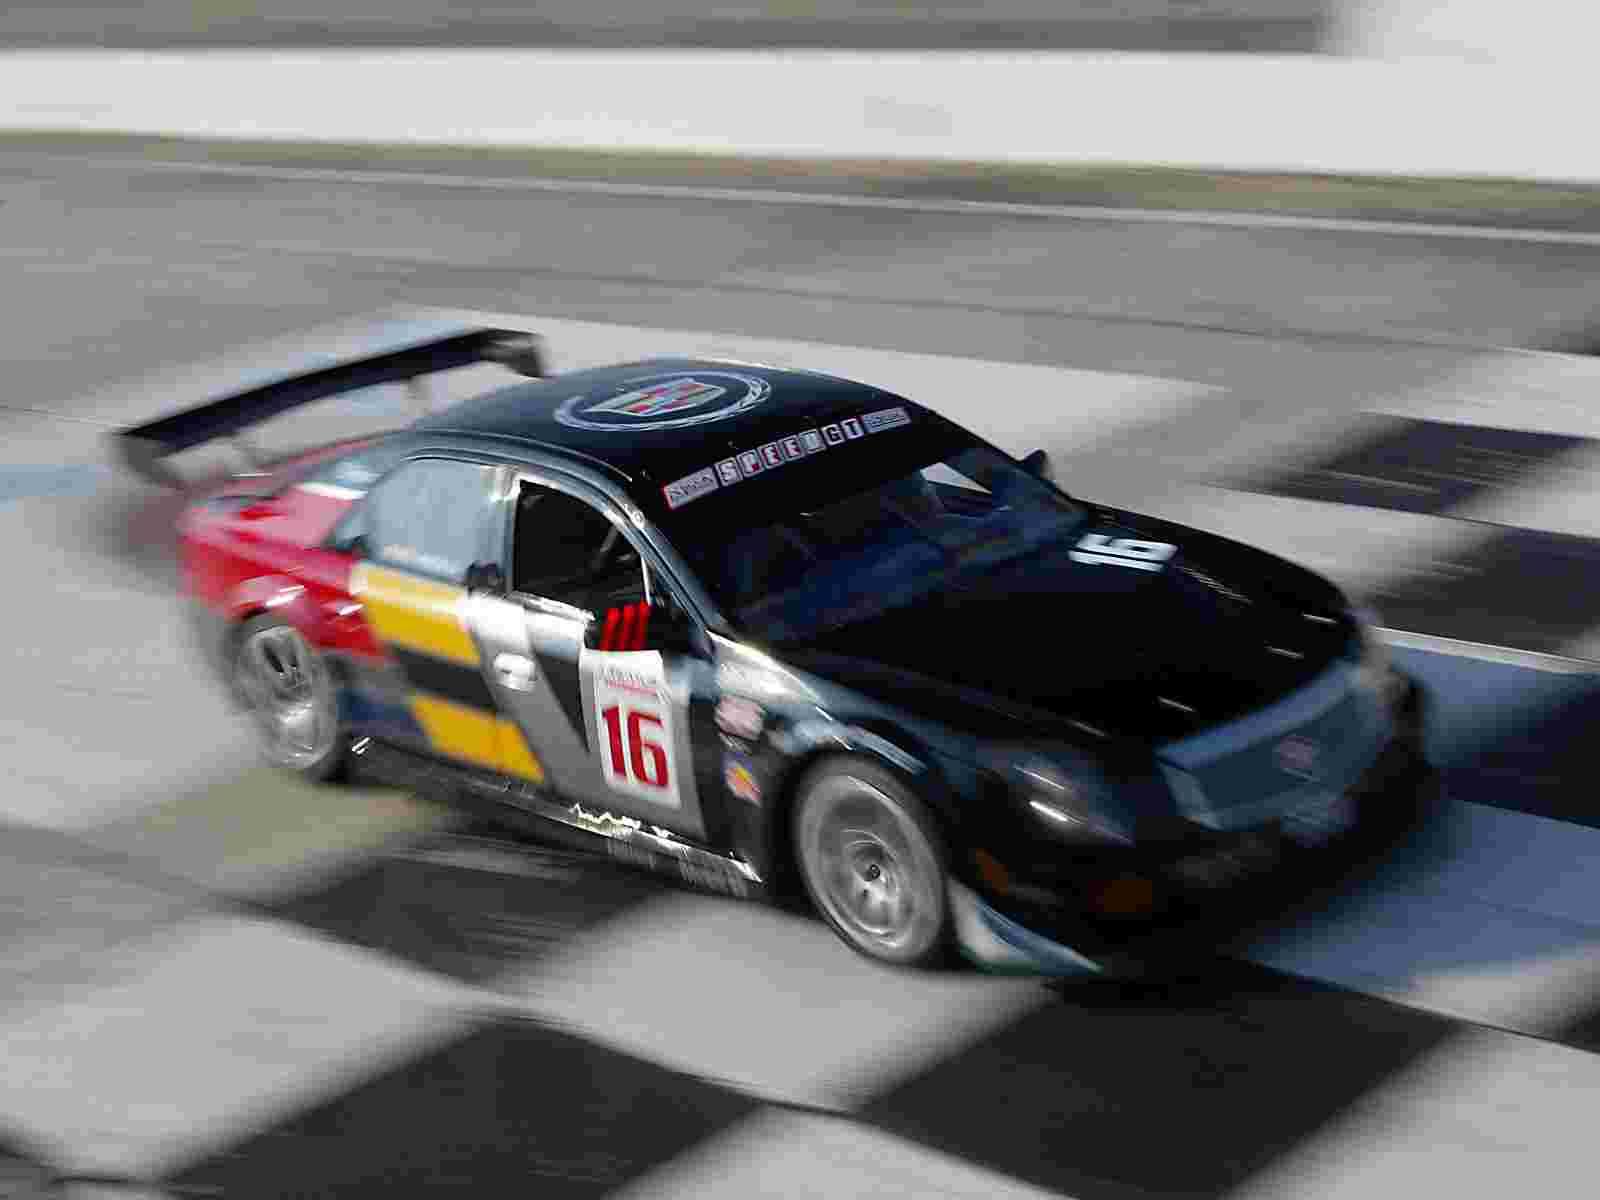 cadillac cts v race car 28663348 wallpaper   Cadillac   Auto Moto 1600x1200